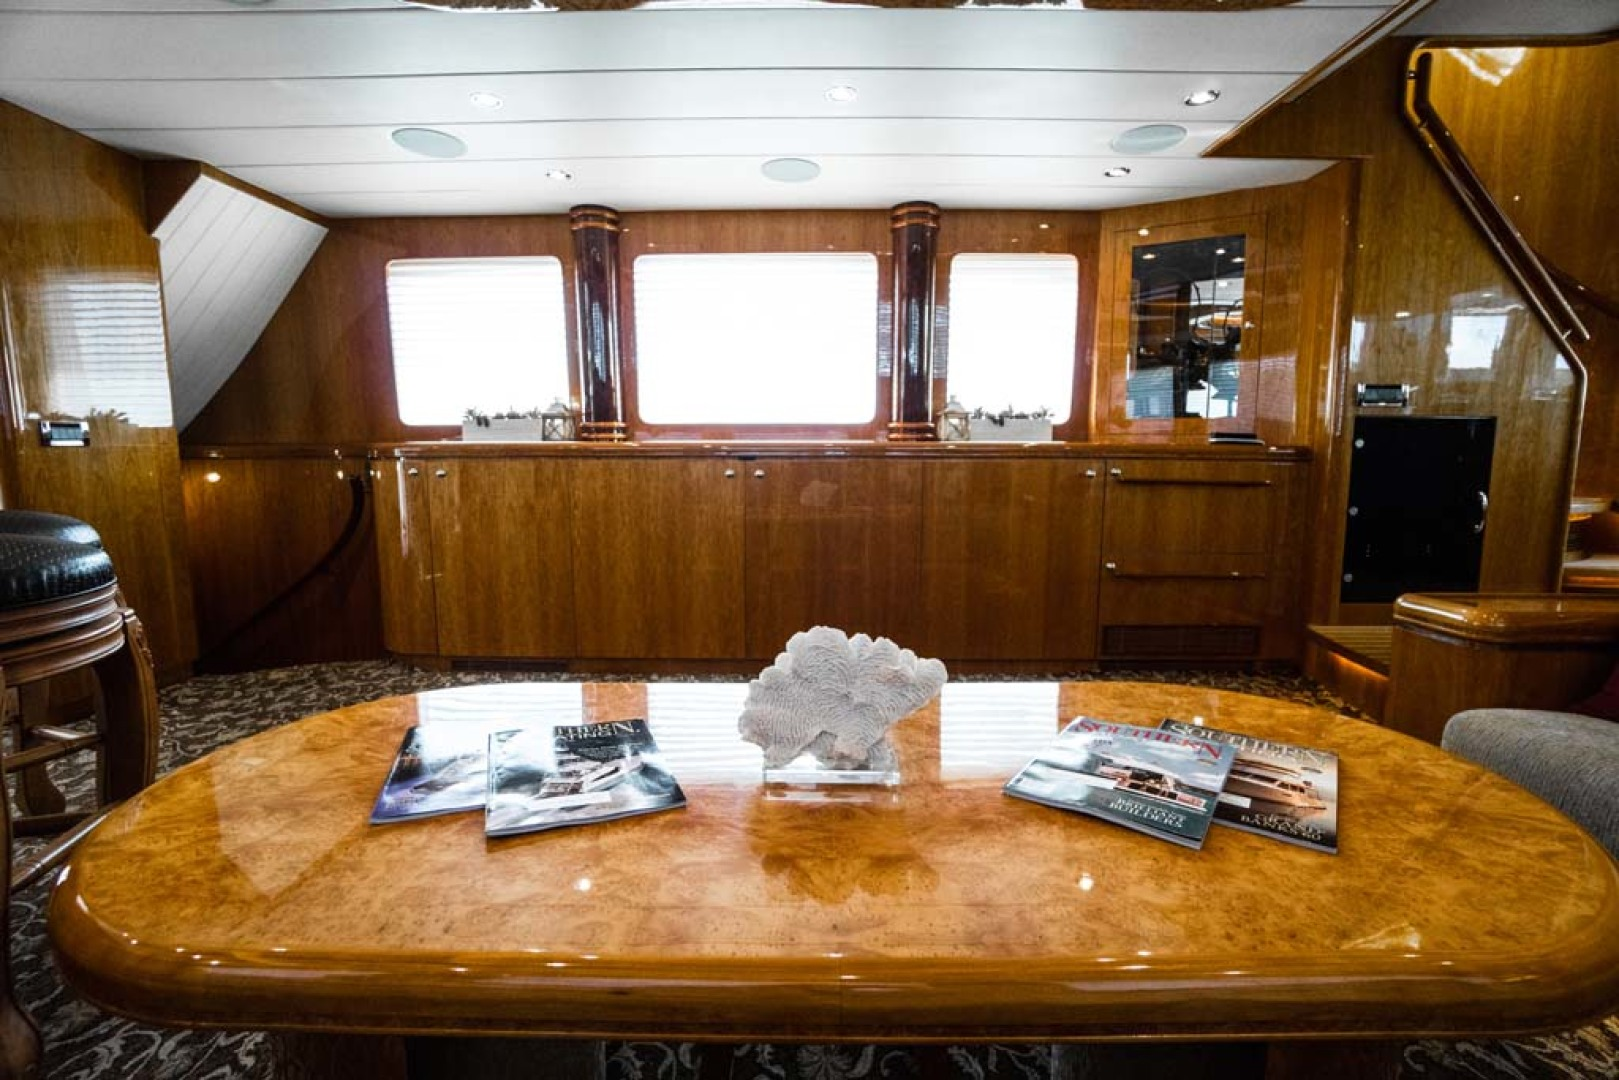 Horizon-Cockpit-Motor-Yacht-2008-Liberation-Stuart-Florida-United-States-Salon-Coffee-Table-1075322